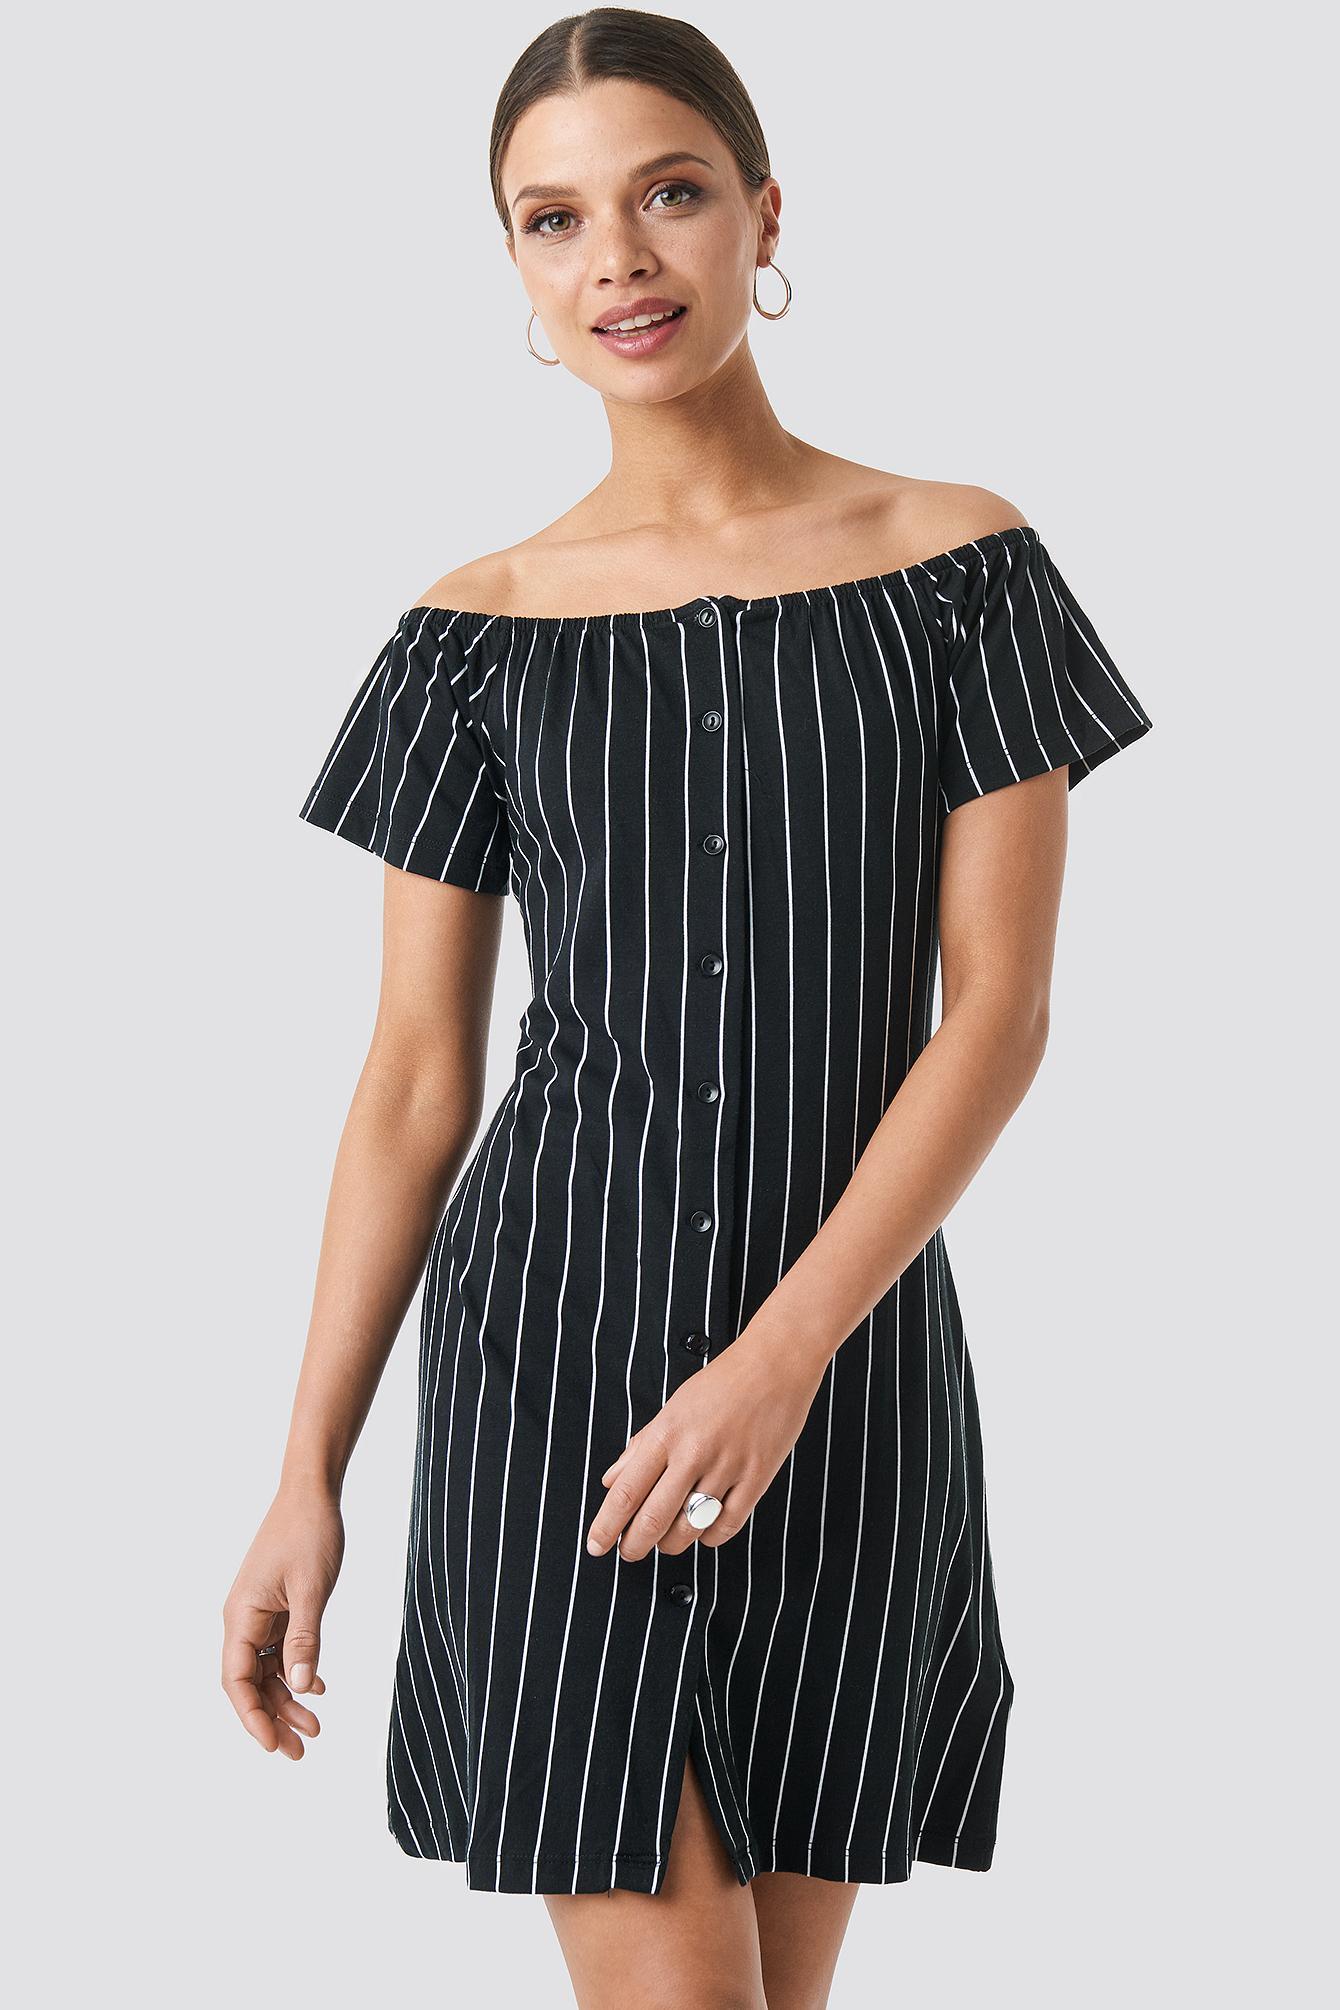 b95b30859ee Lyst - Trendyol Yol Striped Mini Dress Black in Black